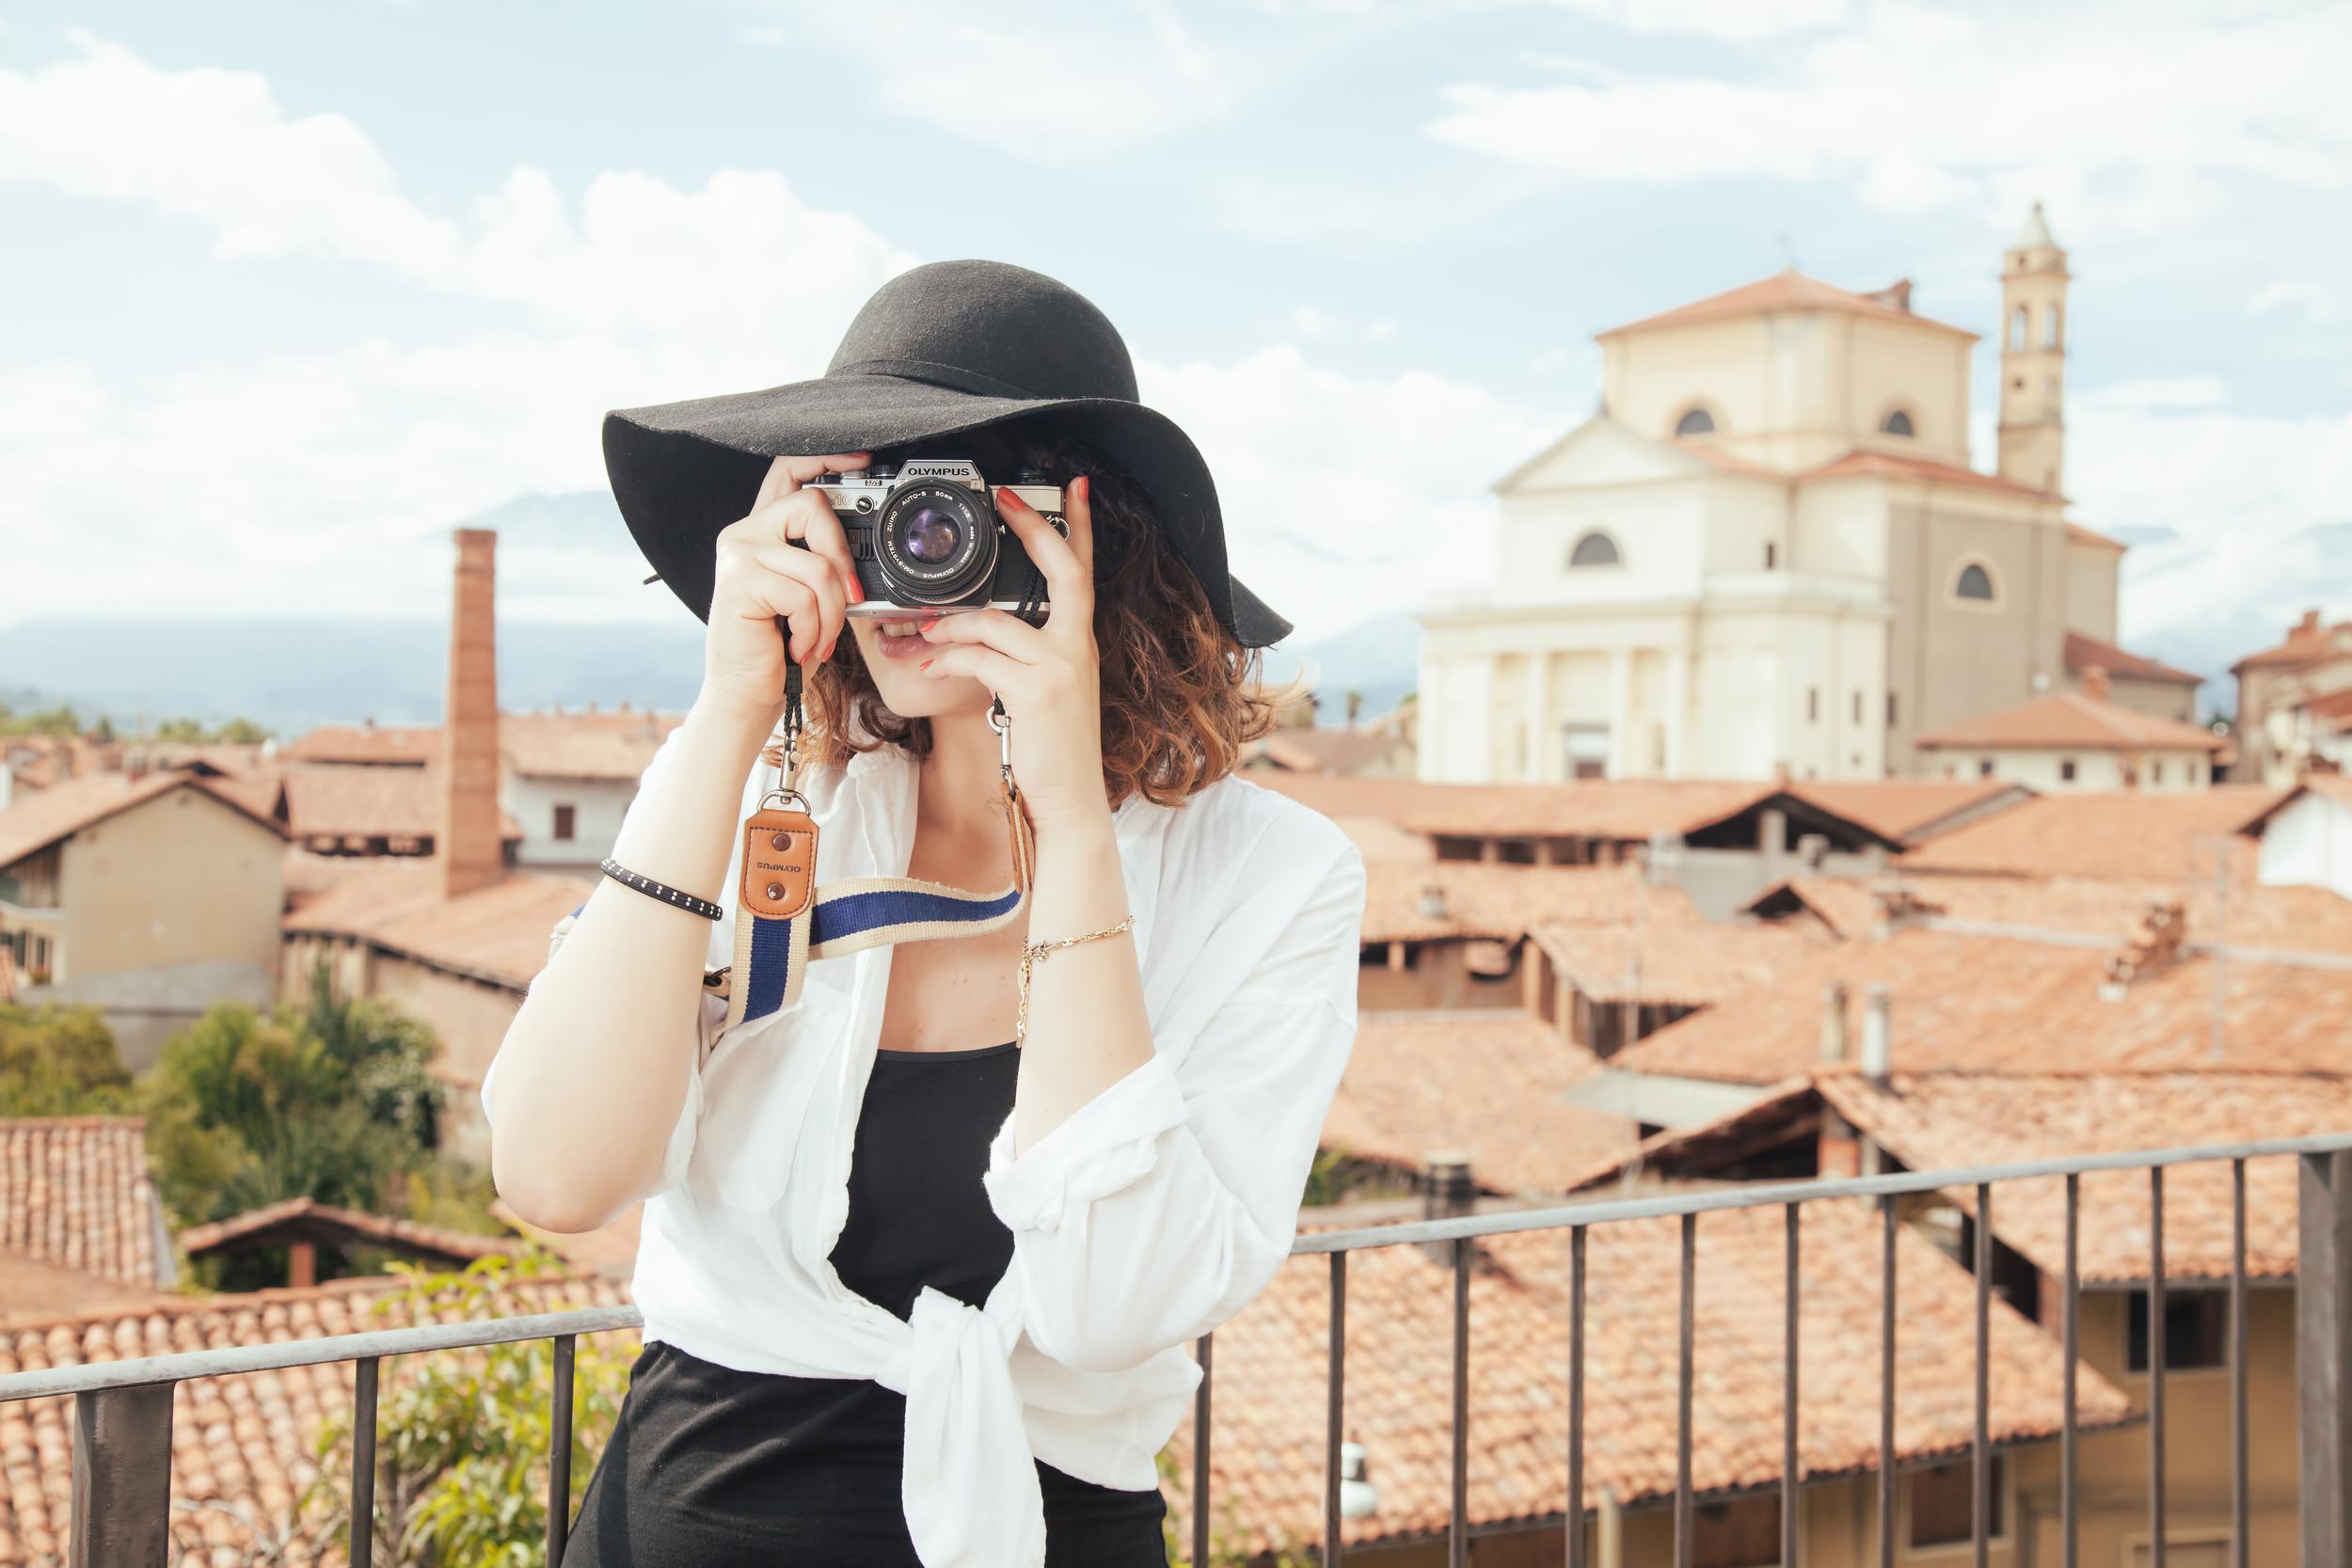 fashion-person-woman-taking-photo.jpg